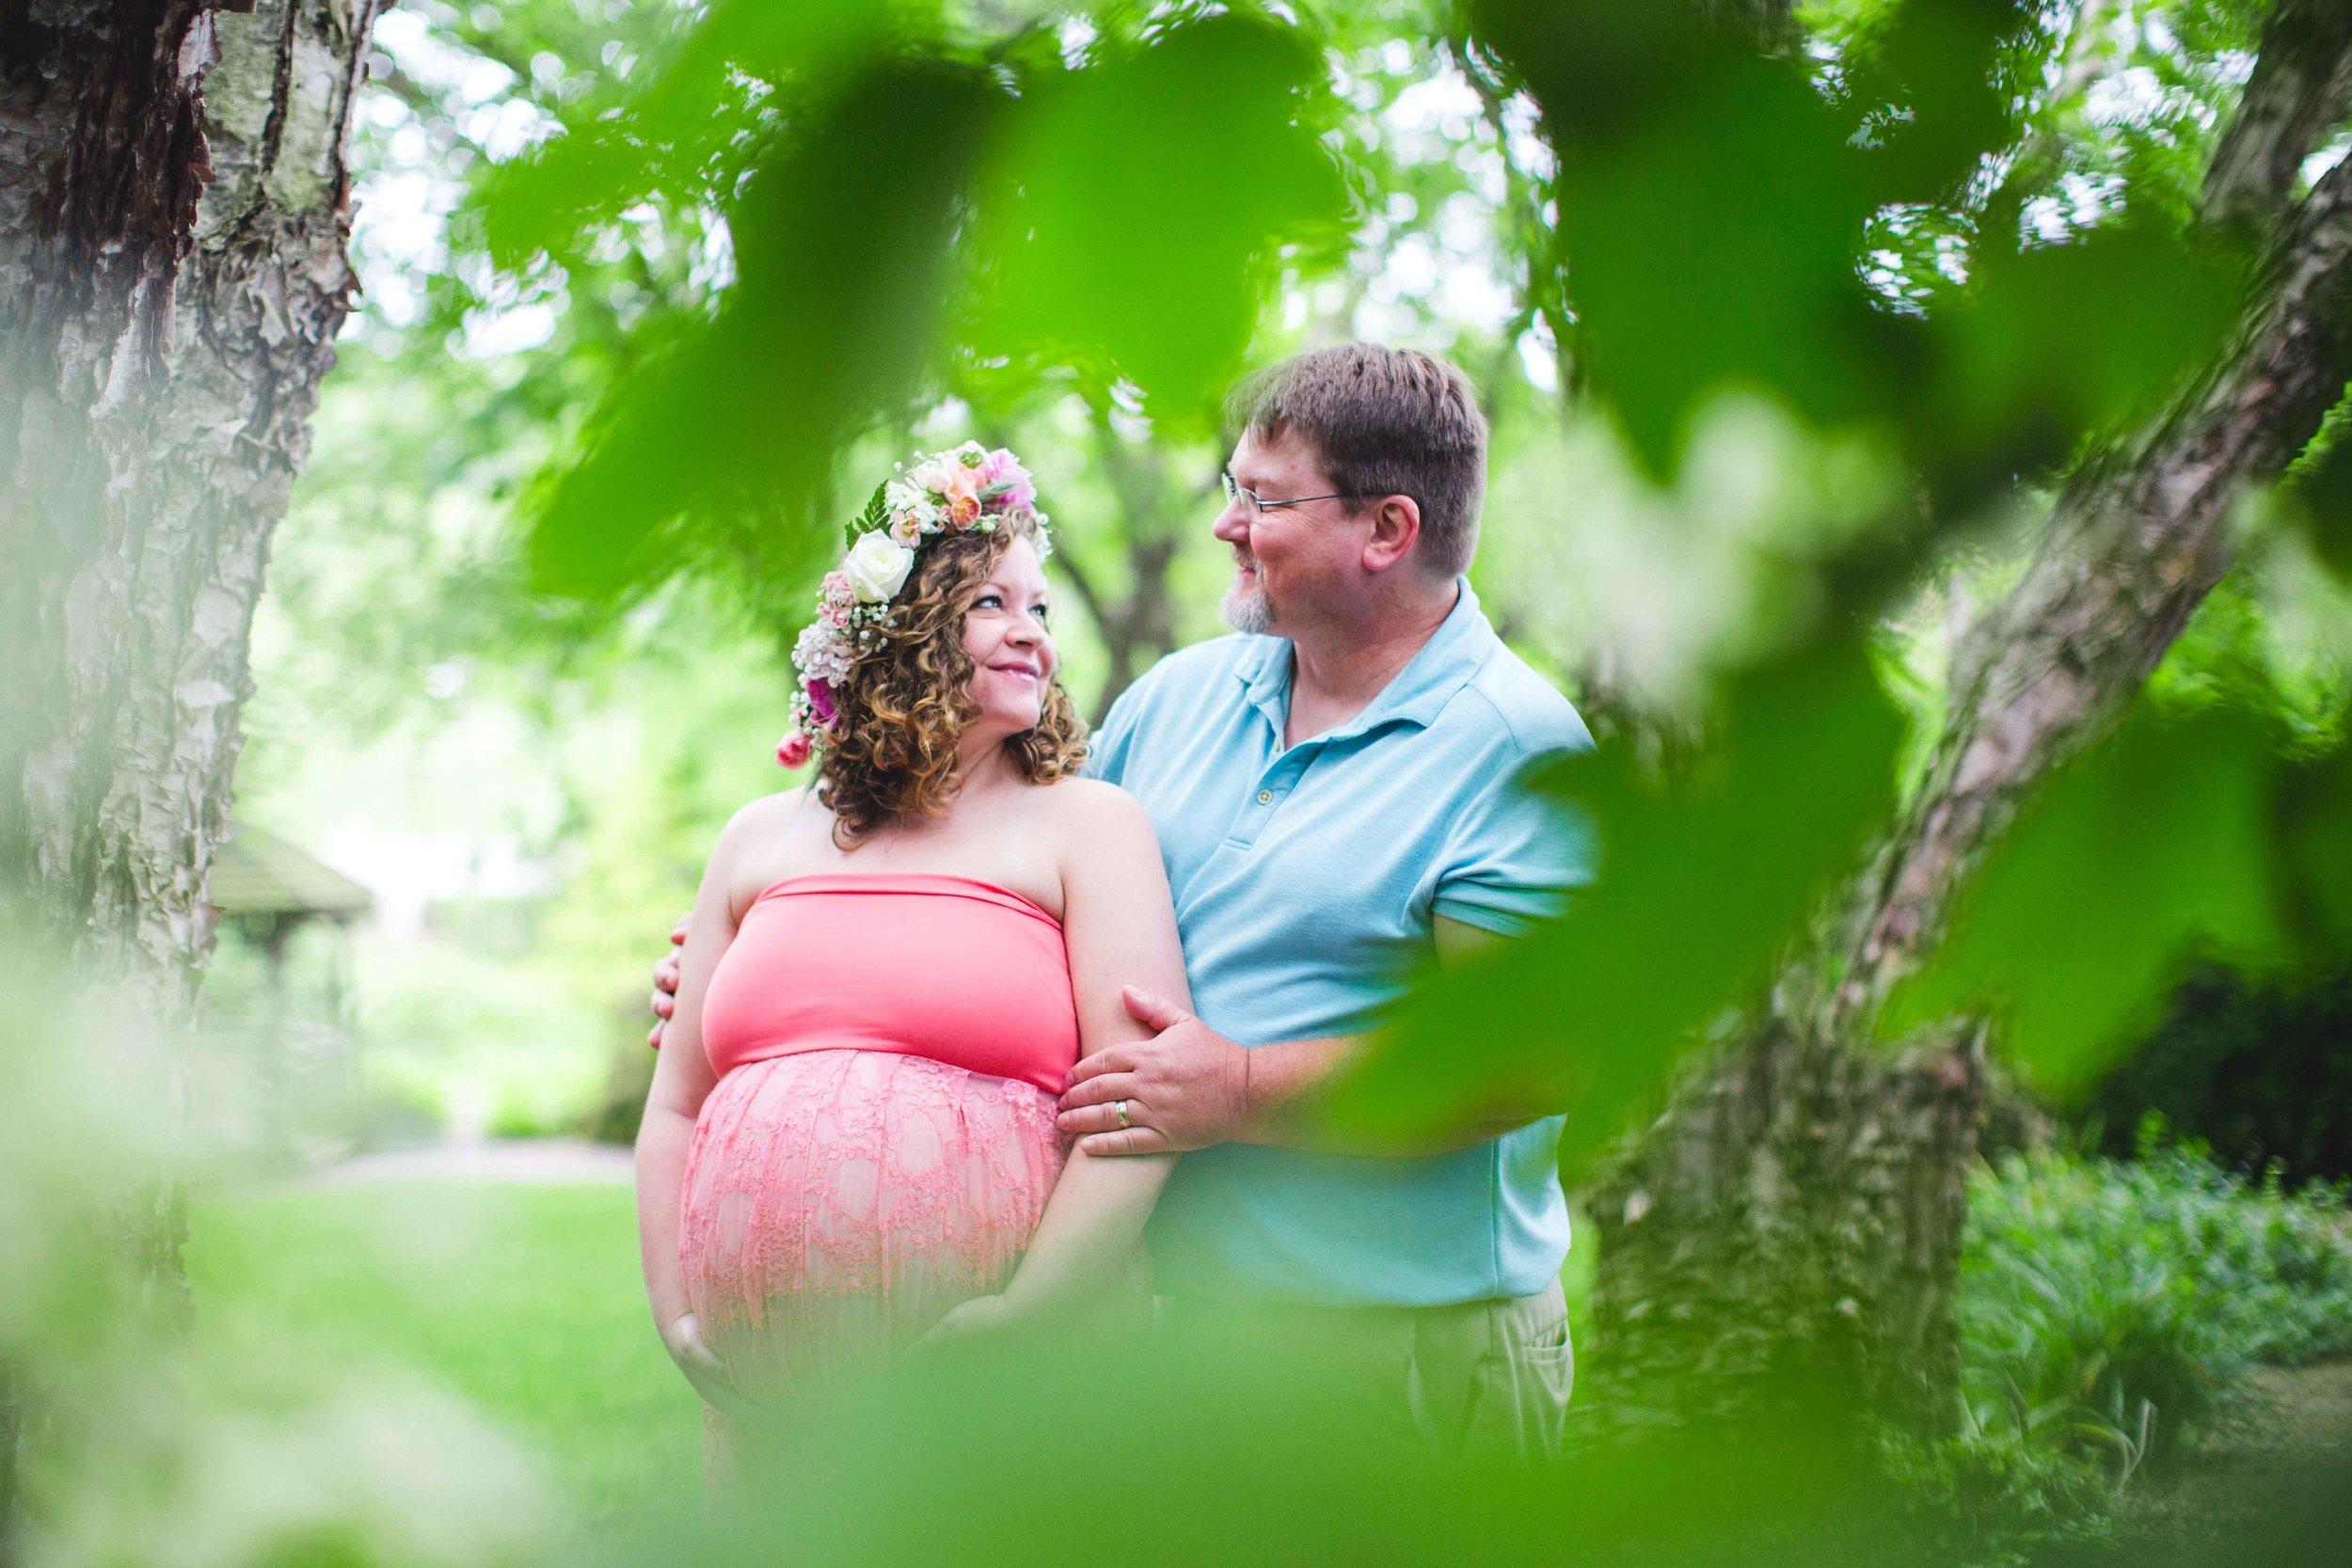 roanoke-maternity-photographer-15.jpg